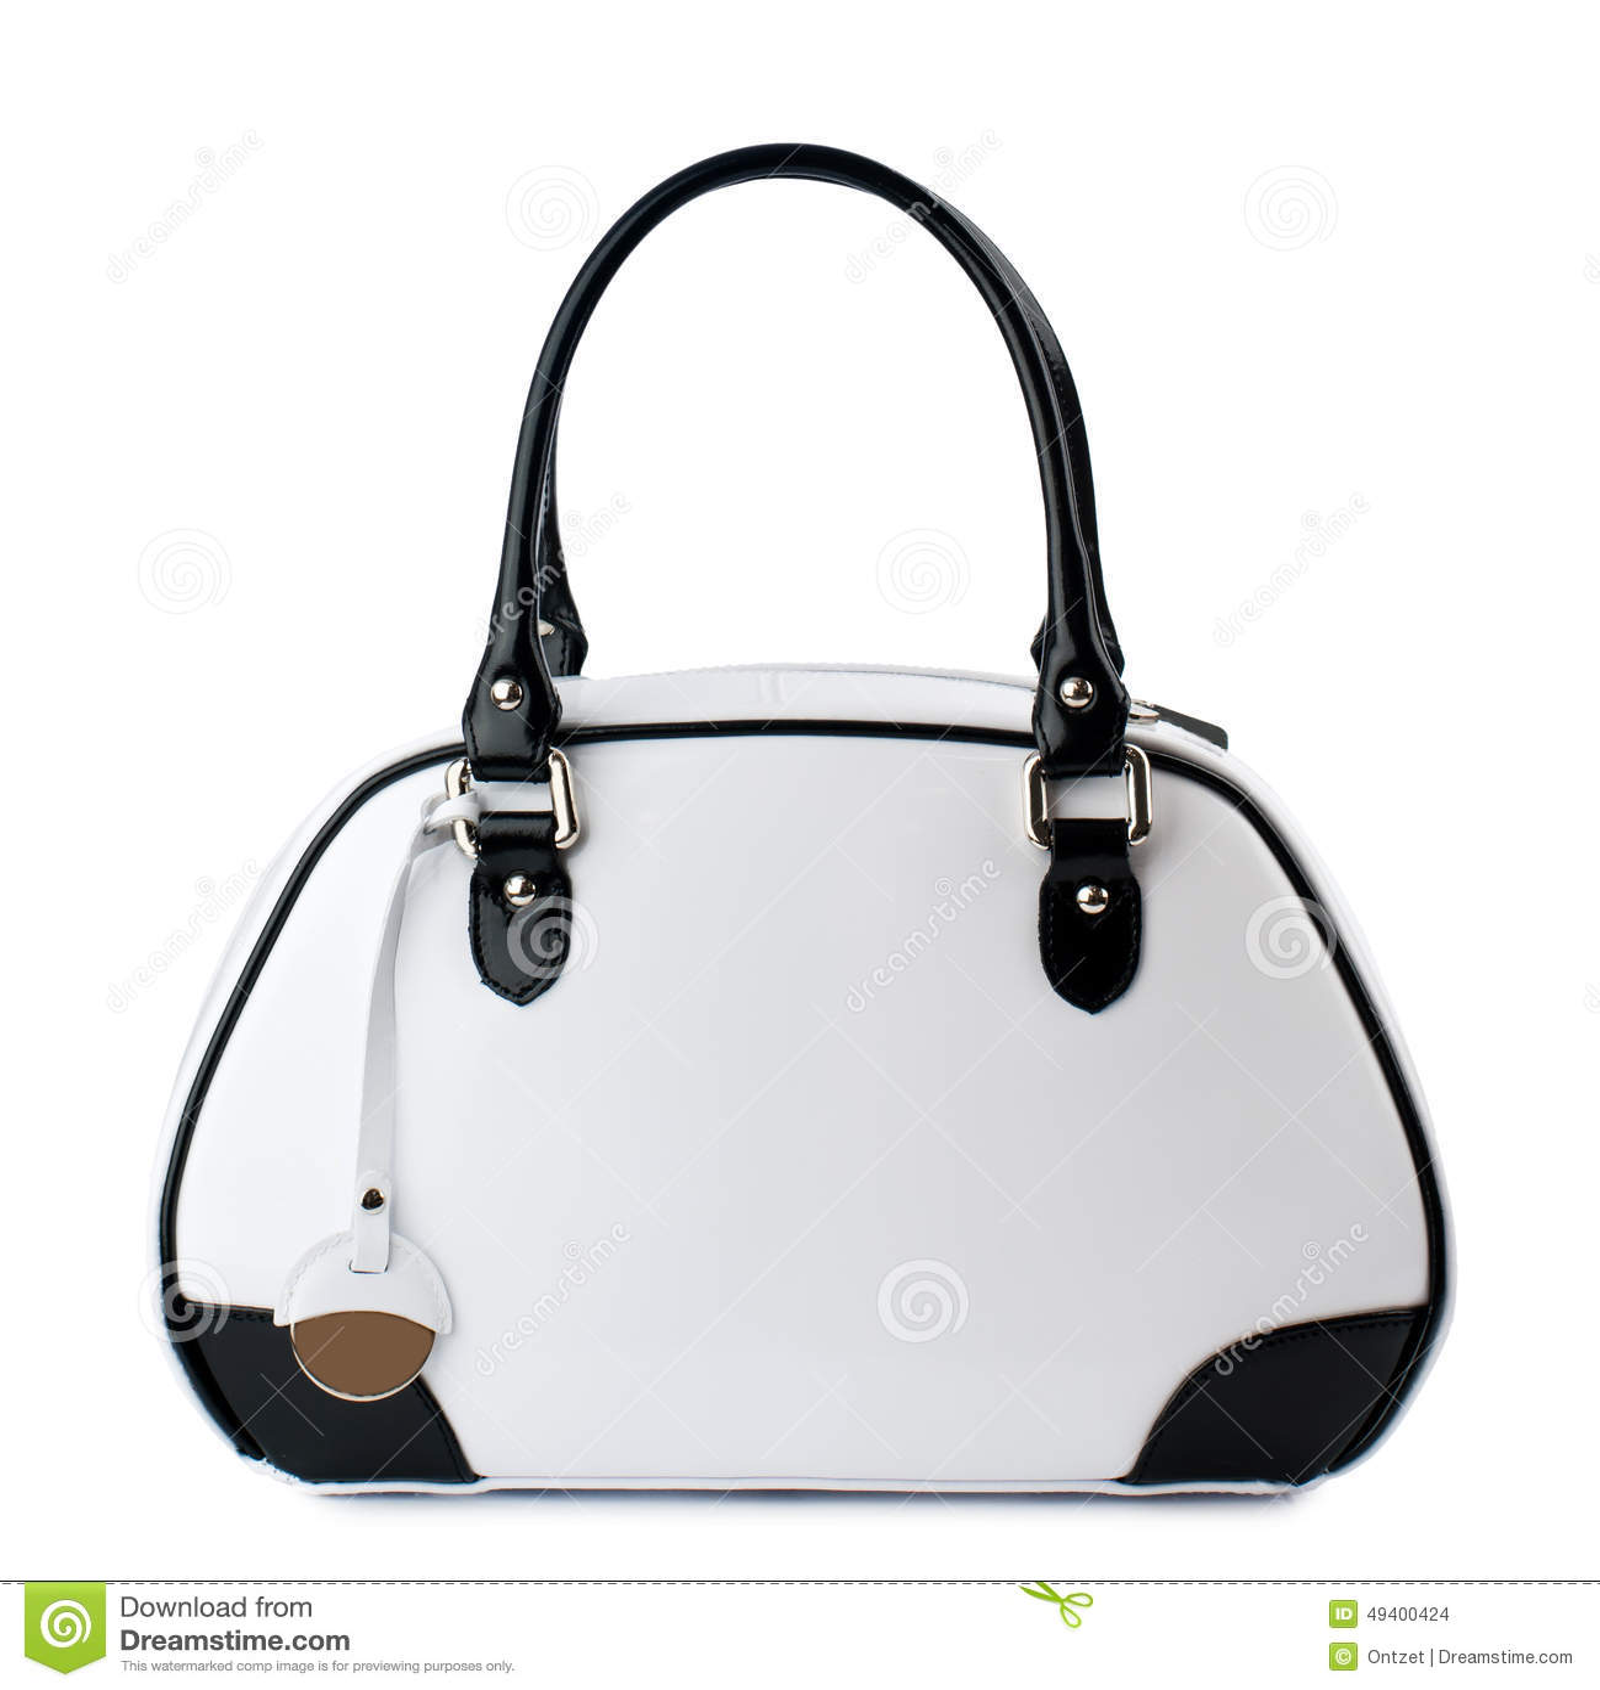 164cee2912 Άσπρη τσάντα με τις μαύρες λαβές που απομονώνονται στο άσπρο υπόβαθρο